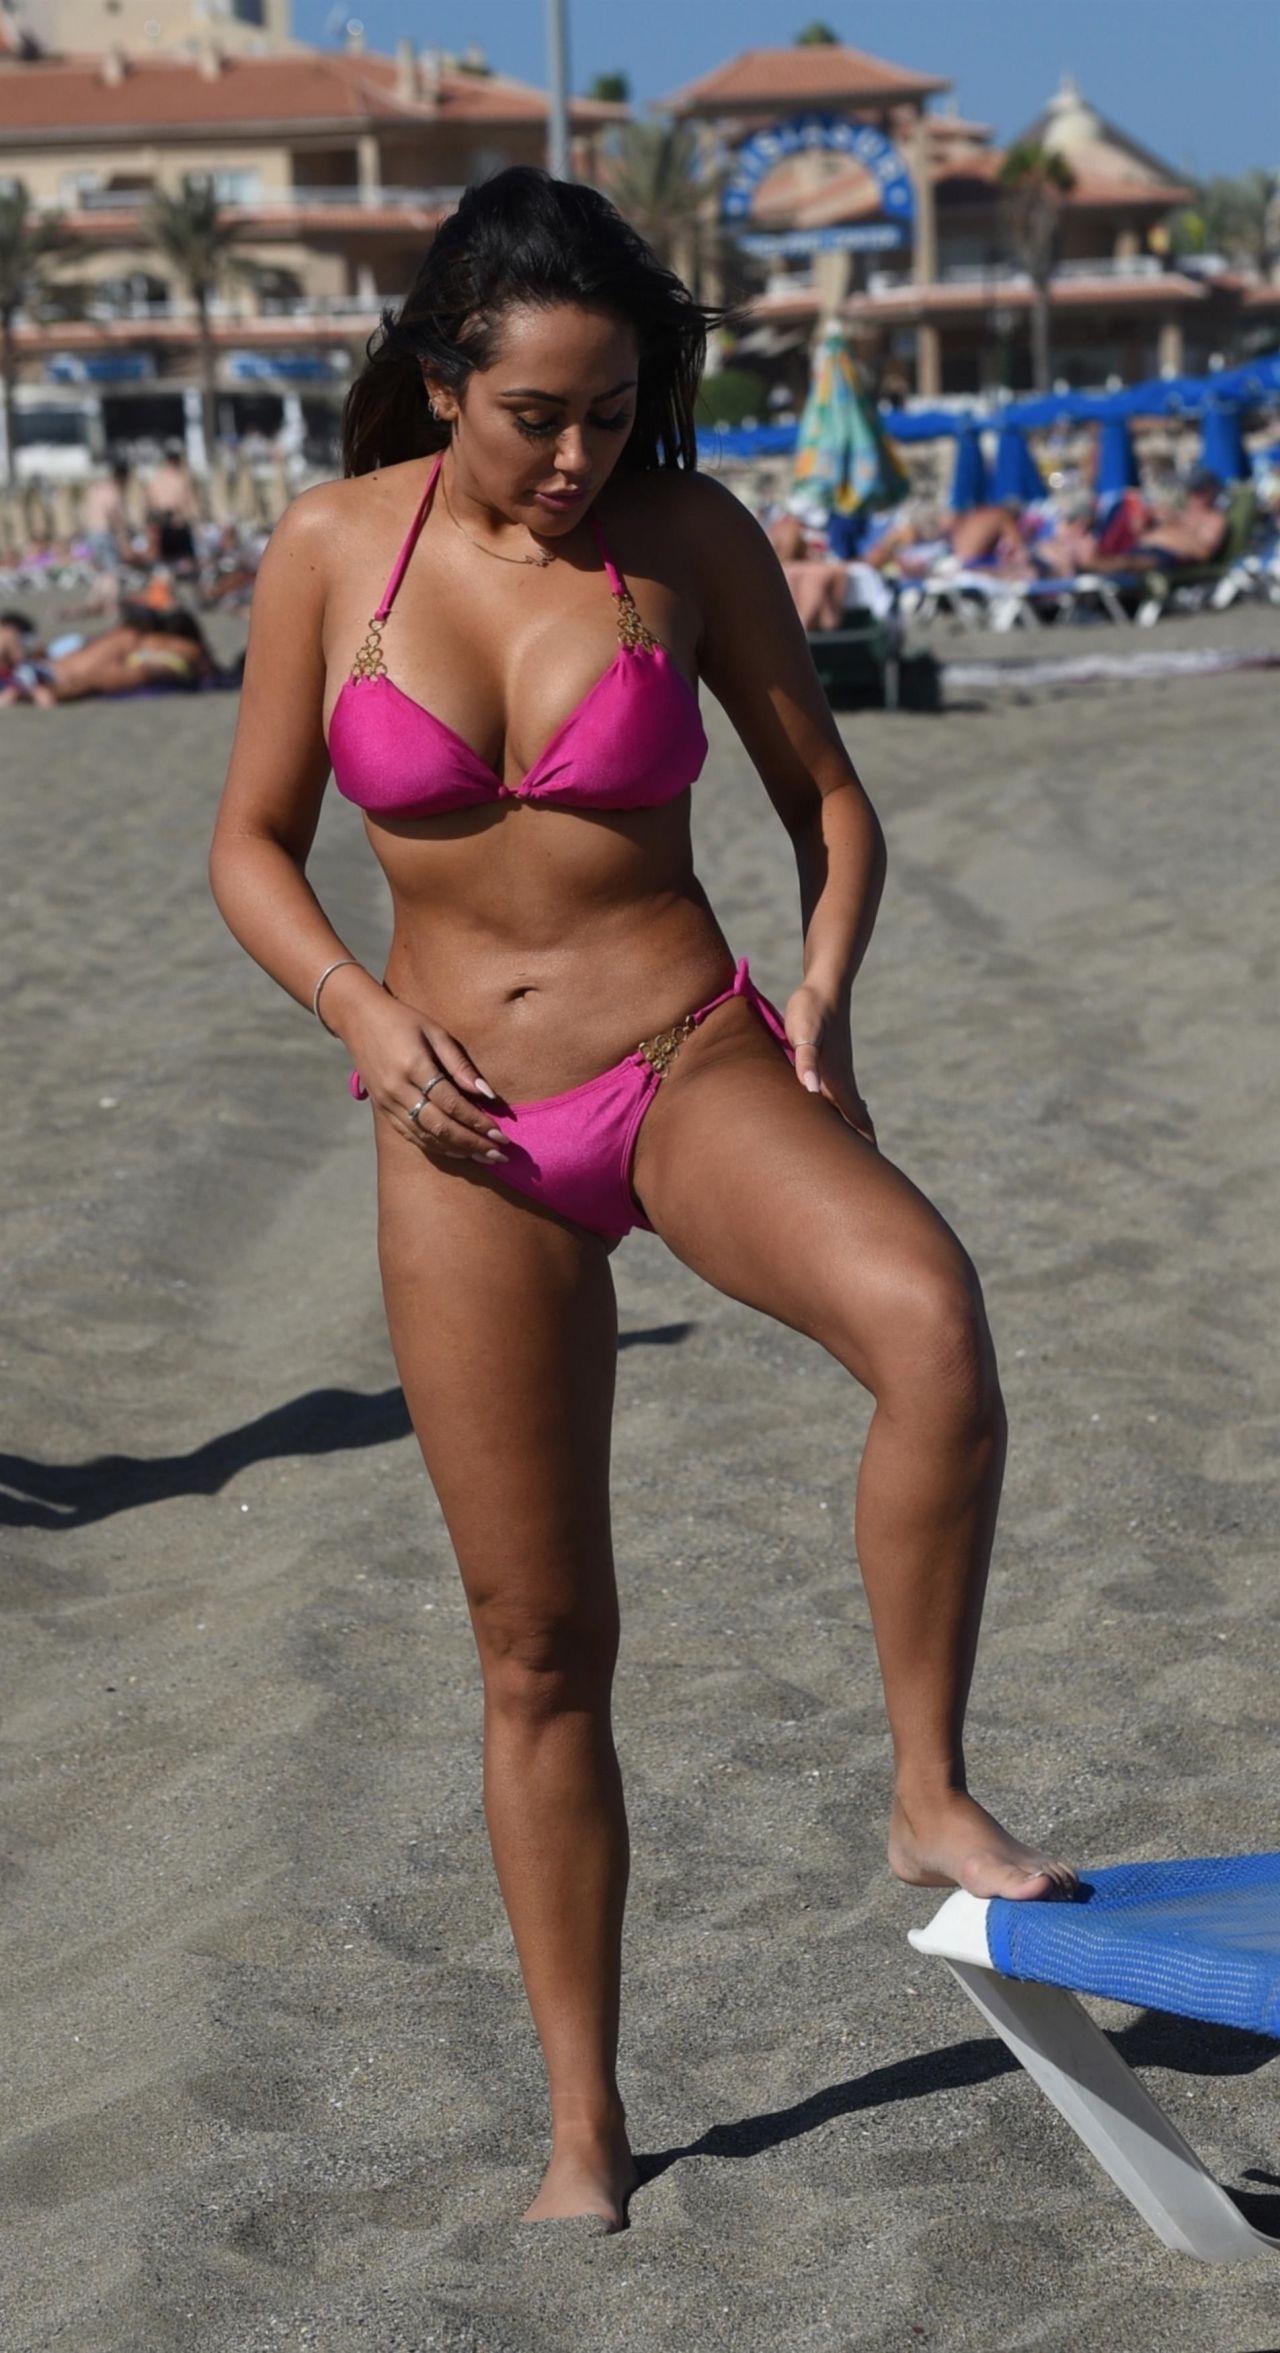 Sophie Kasaei in Bikini on the beach in Turkey Pic 7 of 35